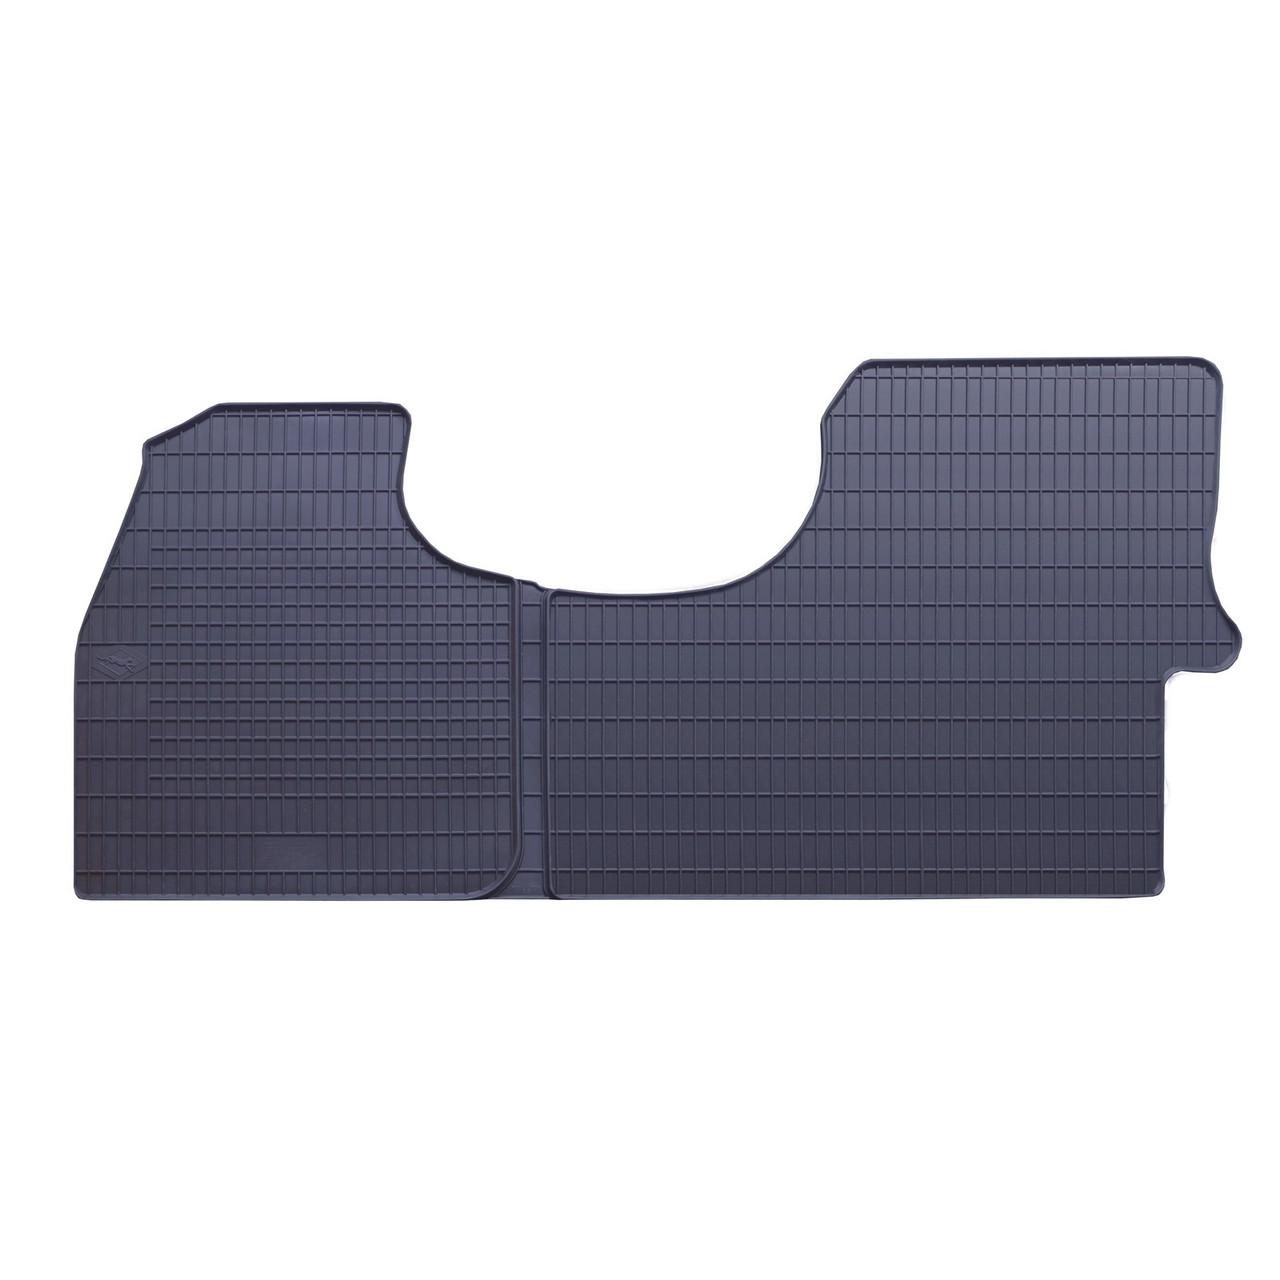 Коврики в салон для Mercedes SPRINTER (06-) / Volkswagen CRAFTER (06-) (1шт) 803/1C